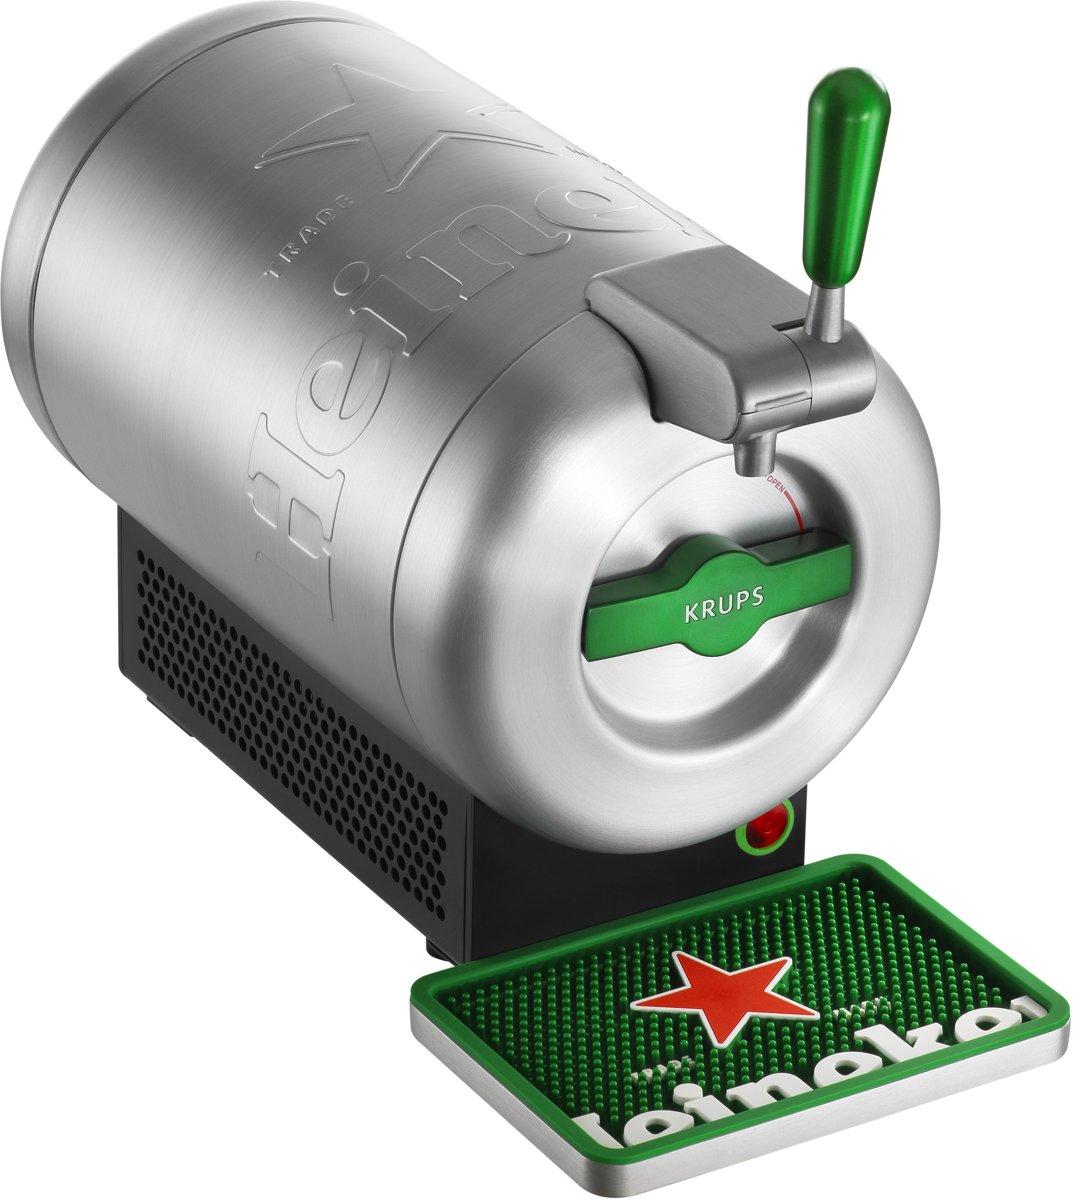 THE SUB Heineken Edition, Krups VB650E10 - Biertap voor €84 dmvv code